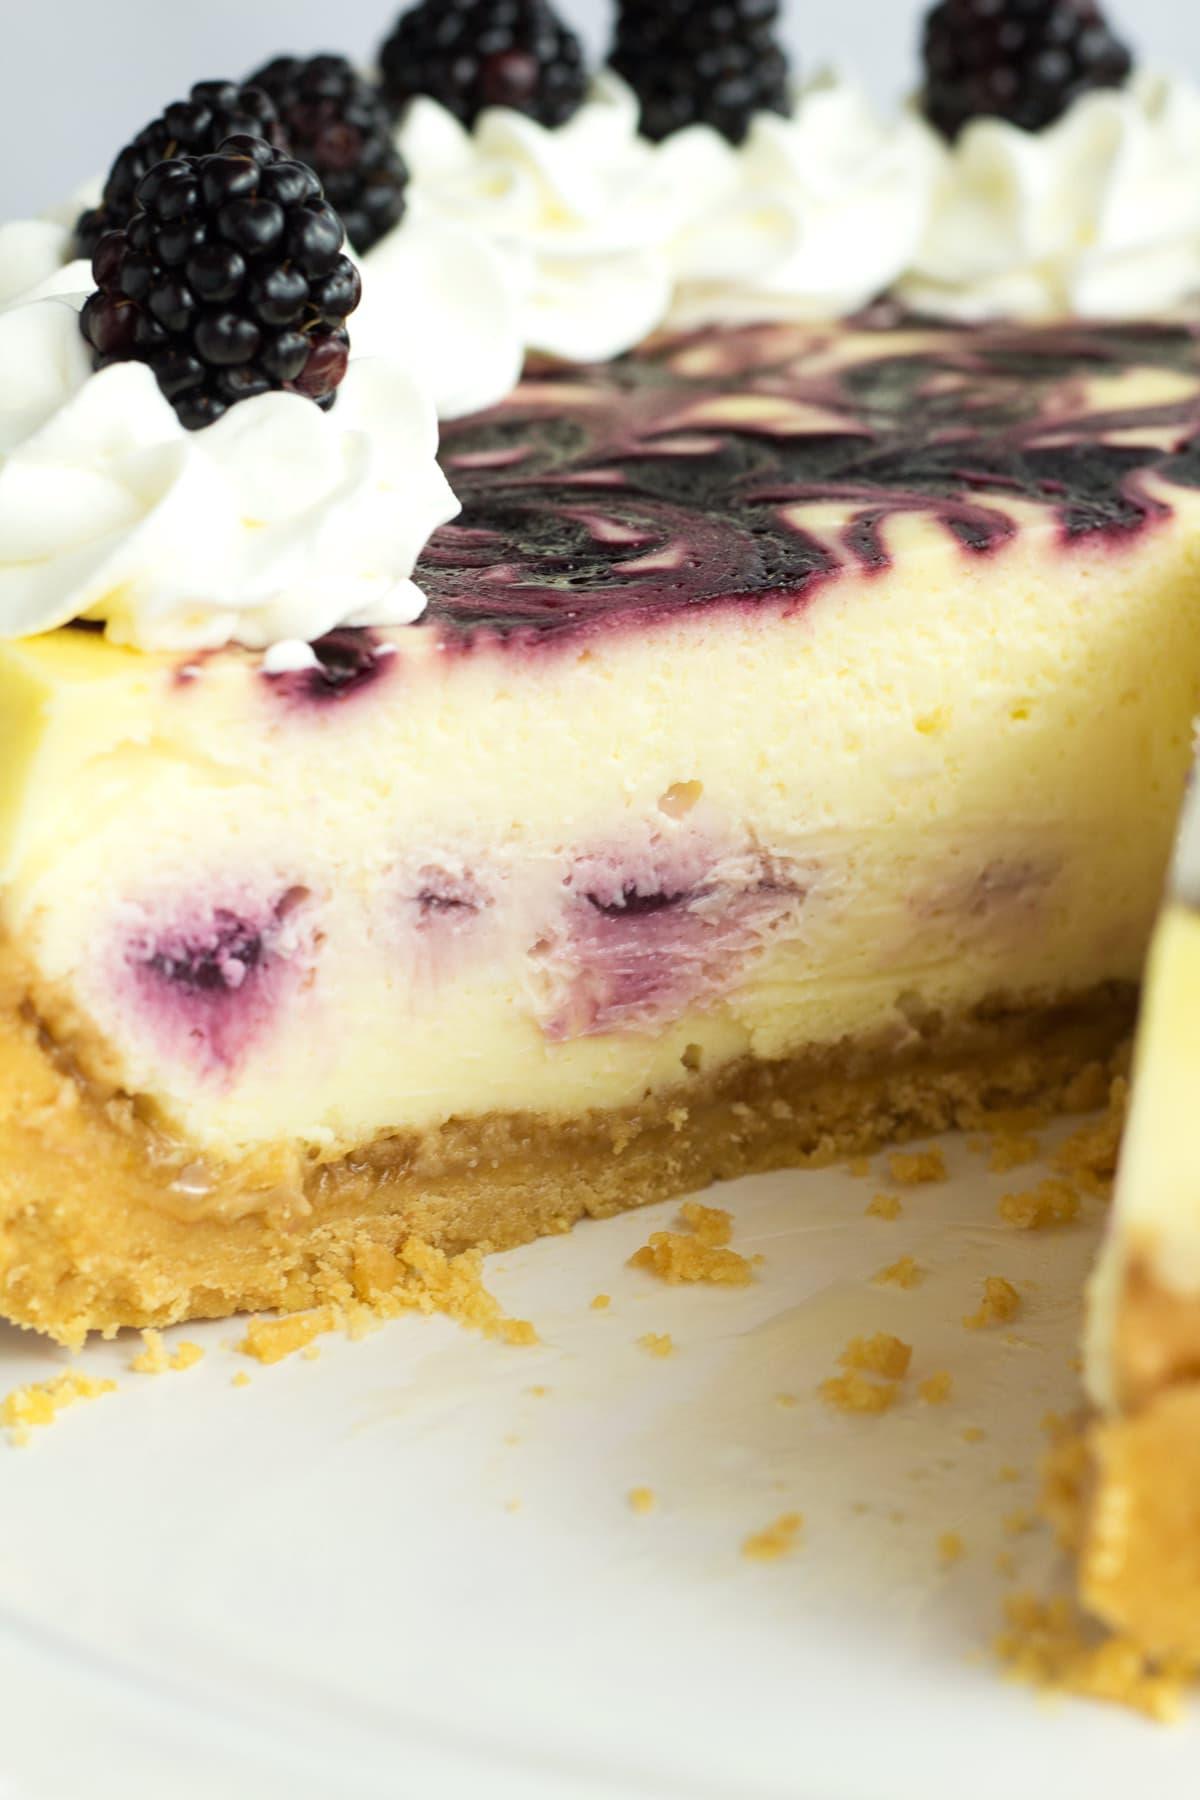 Inside of blackberry swirl cheesecake showing crust, inside swirl, and top swirl.